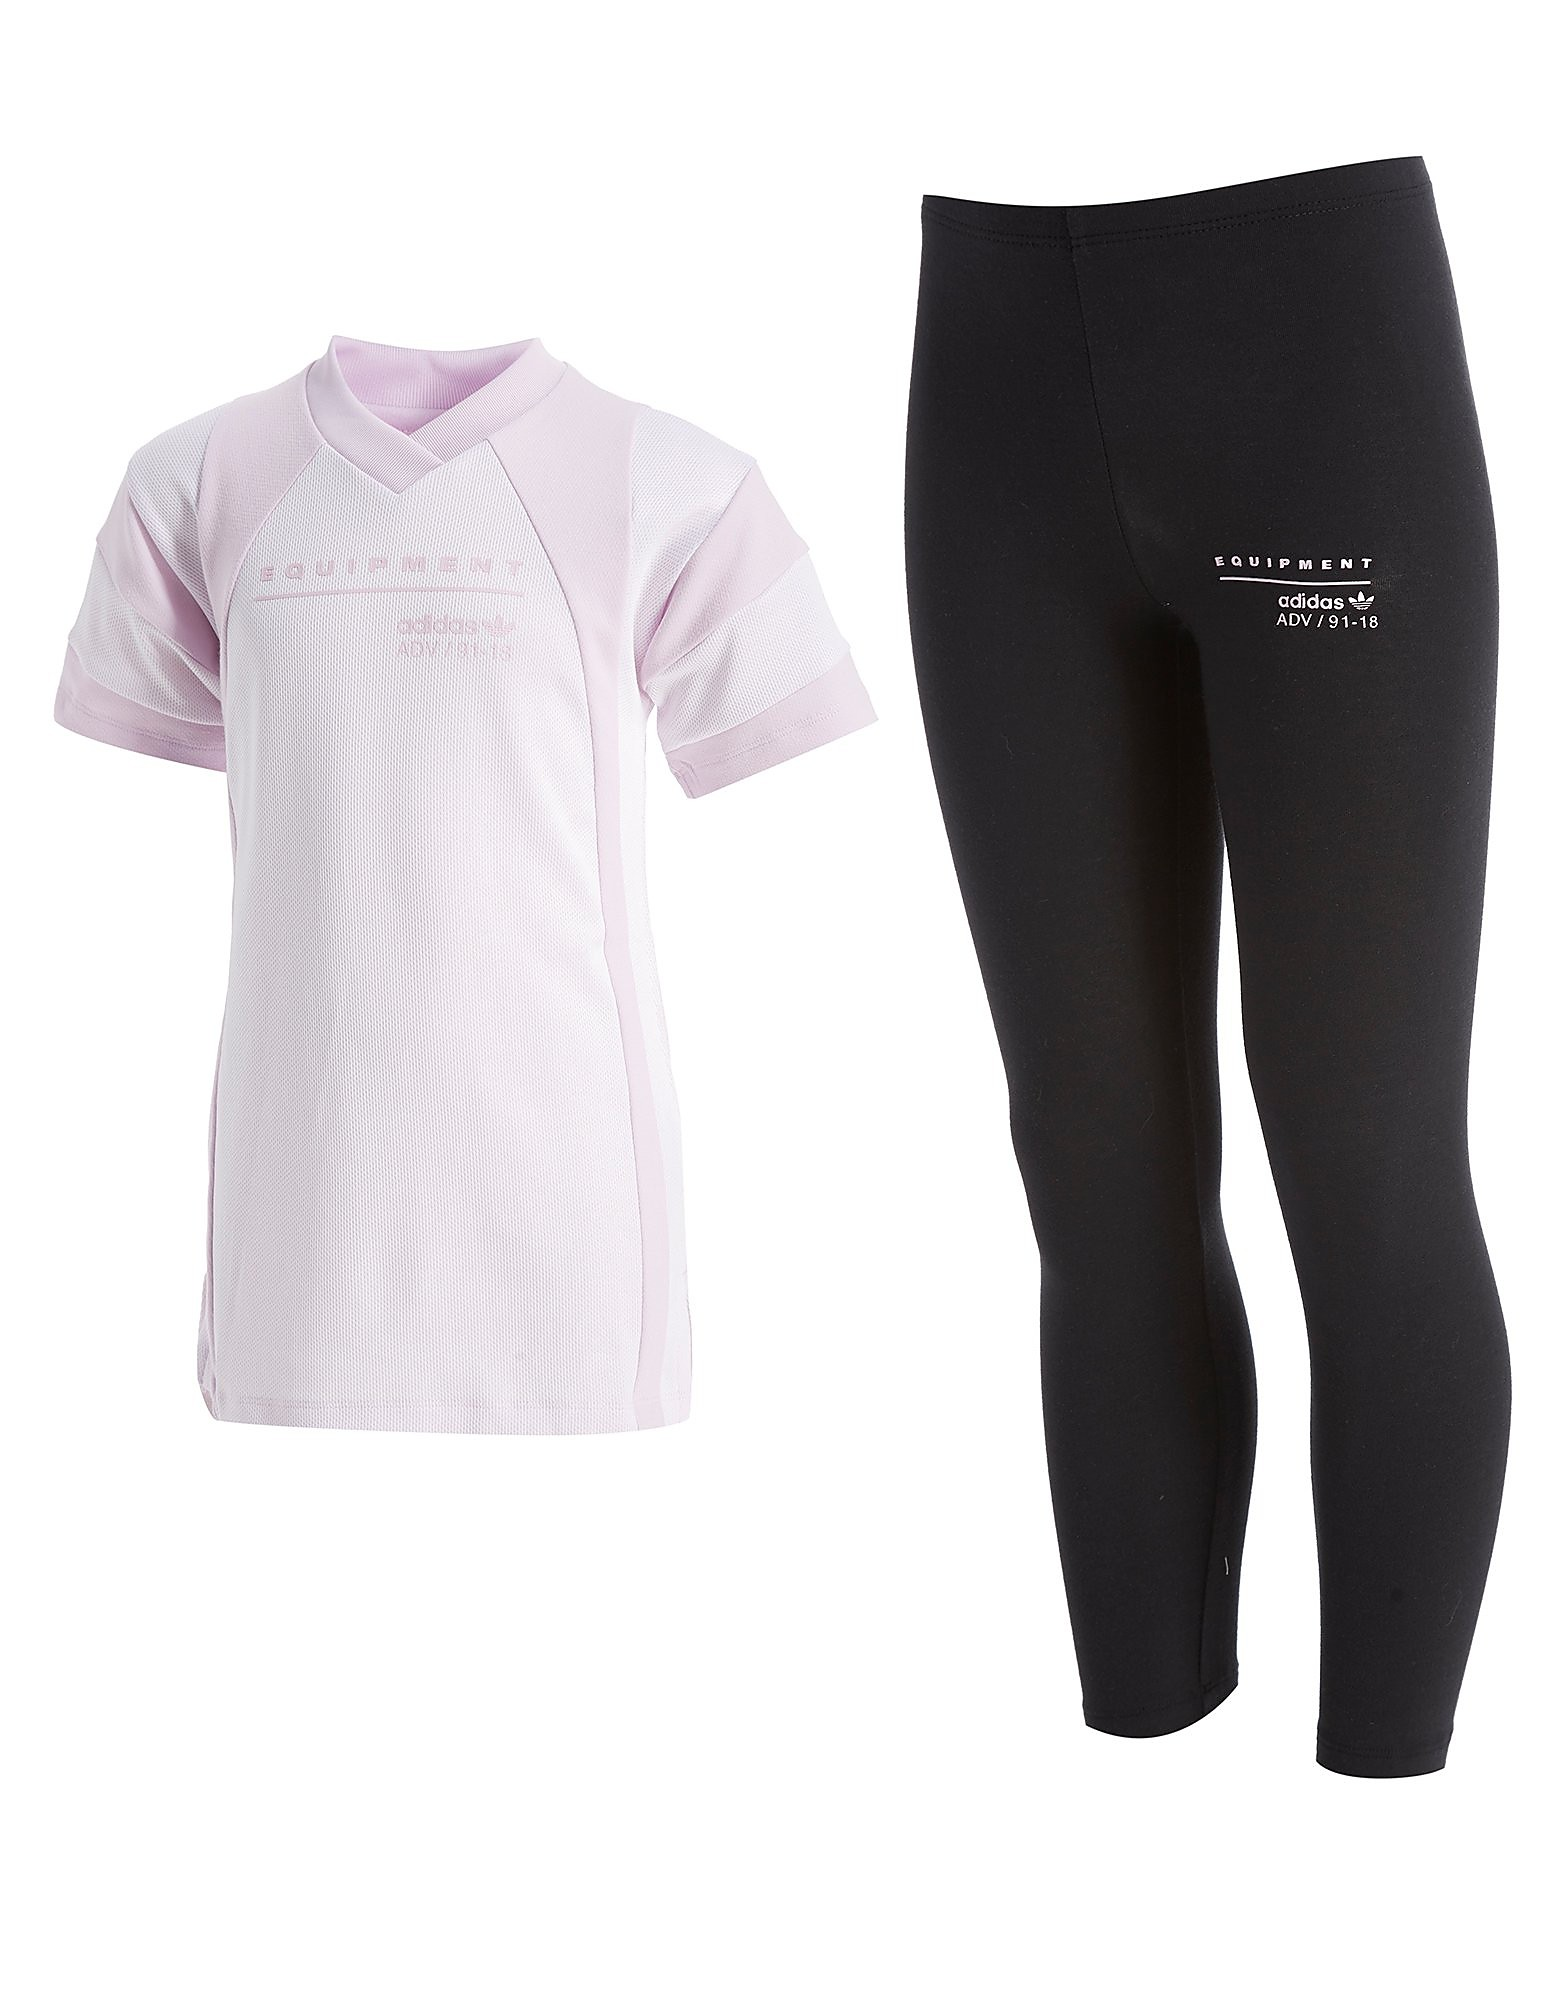 adidas Originals Girls' EQT T-Shirt & Legging Set Kinderen - Light Purple/Black - Kind